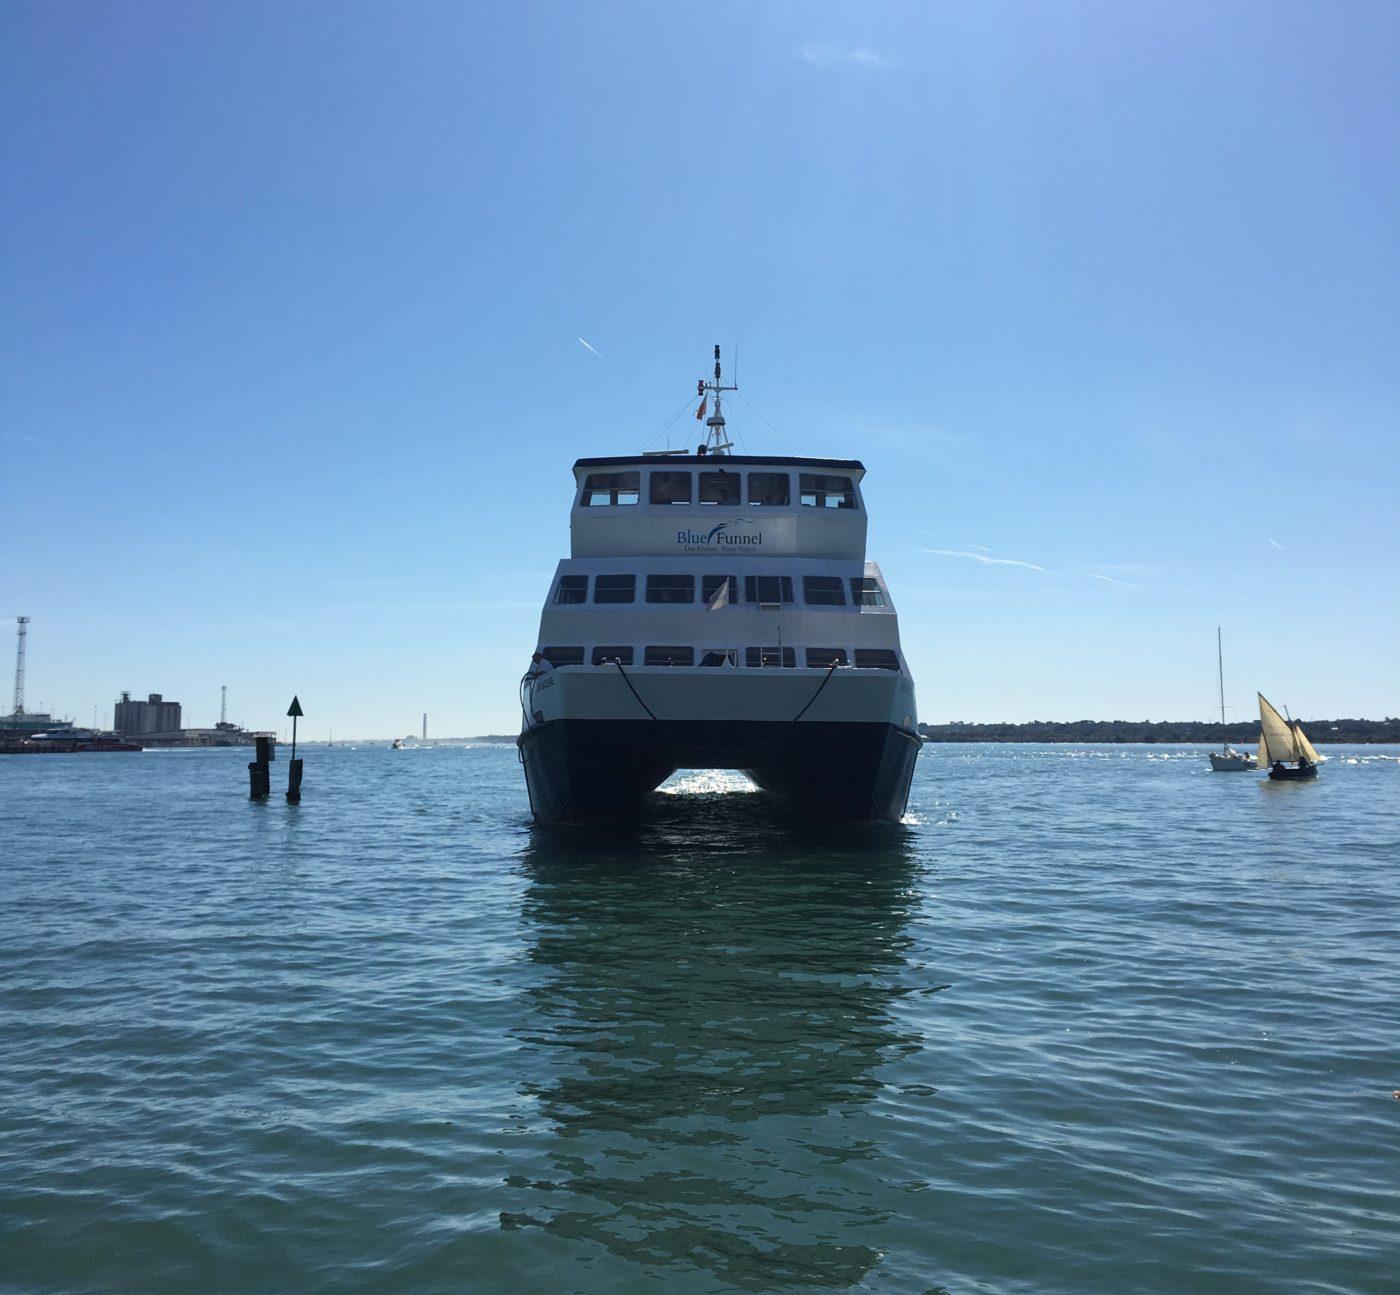 Southampton Boat Show mini cruise